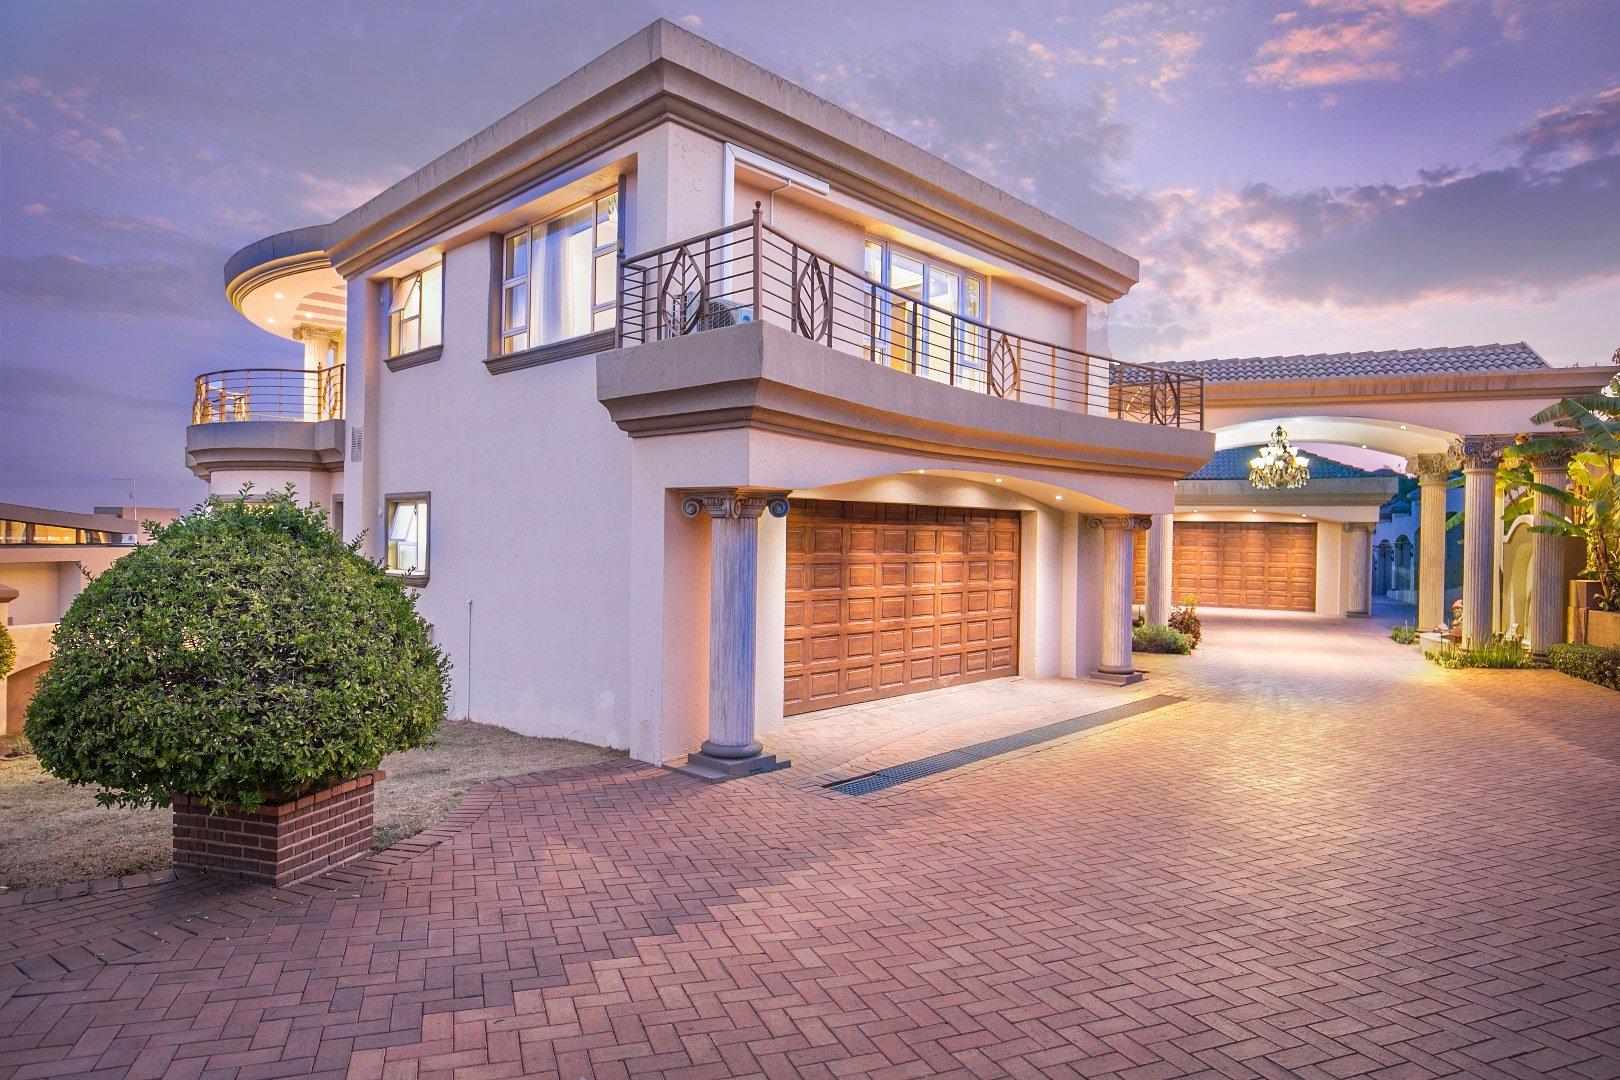 Alberton, Meyersdal Eco Estate Property  | Houses For Sale Meyersdal Eco Estate, Meyersdal Eco Estate, House 5 bedrooms property for sale Price:8,999,000